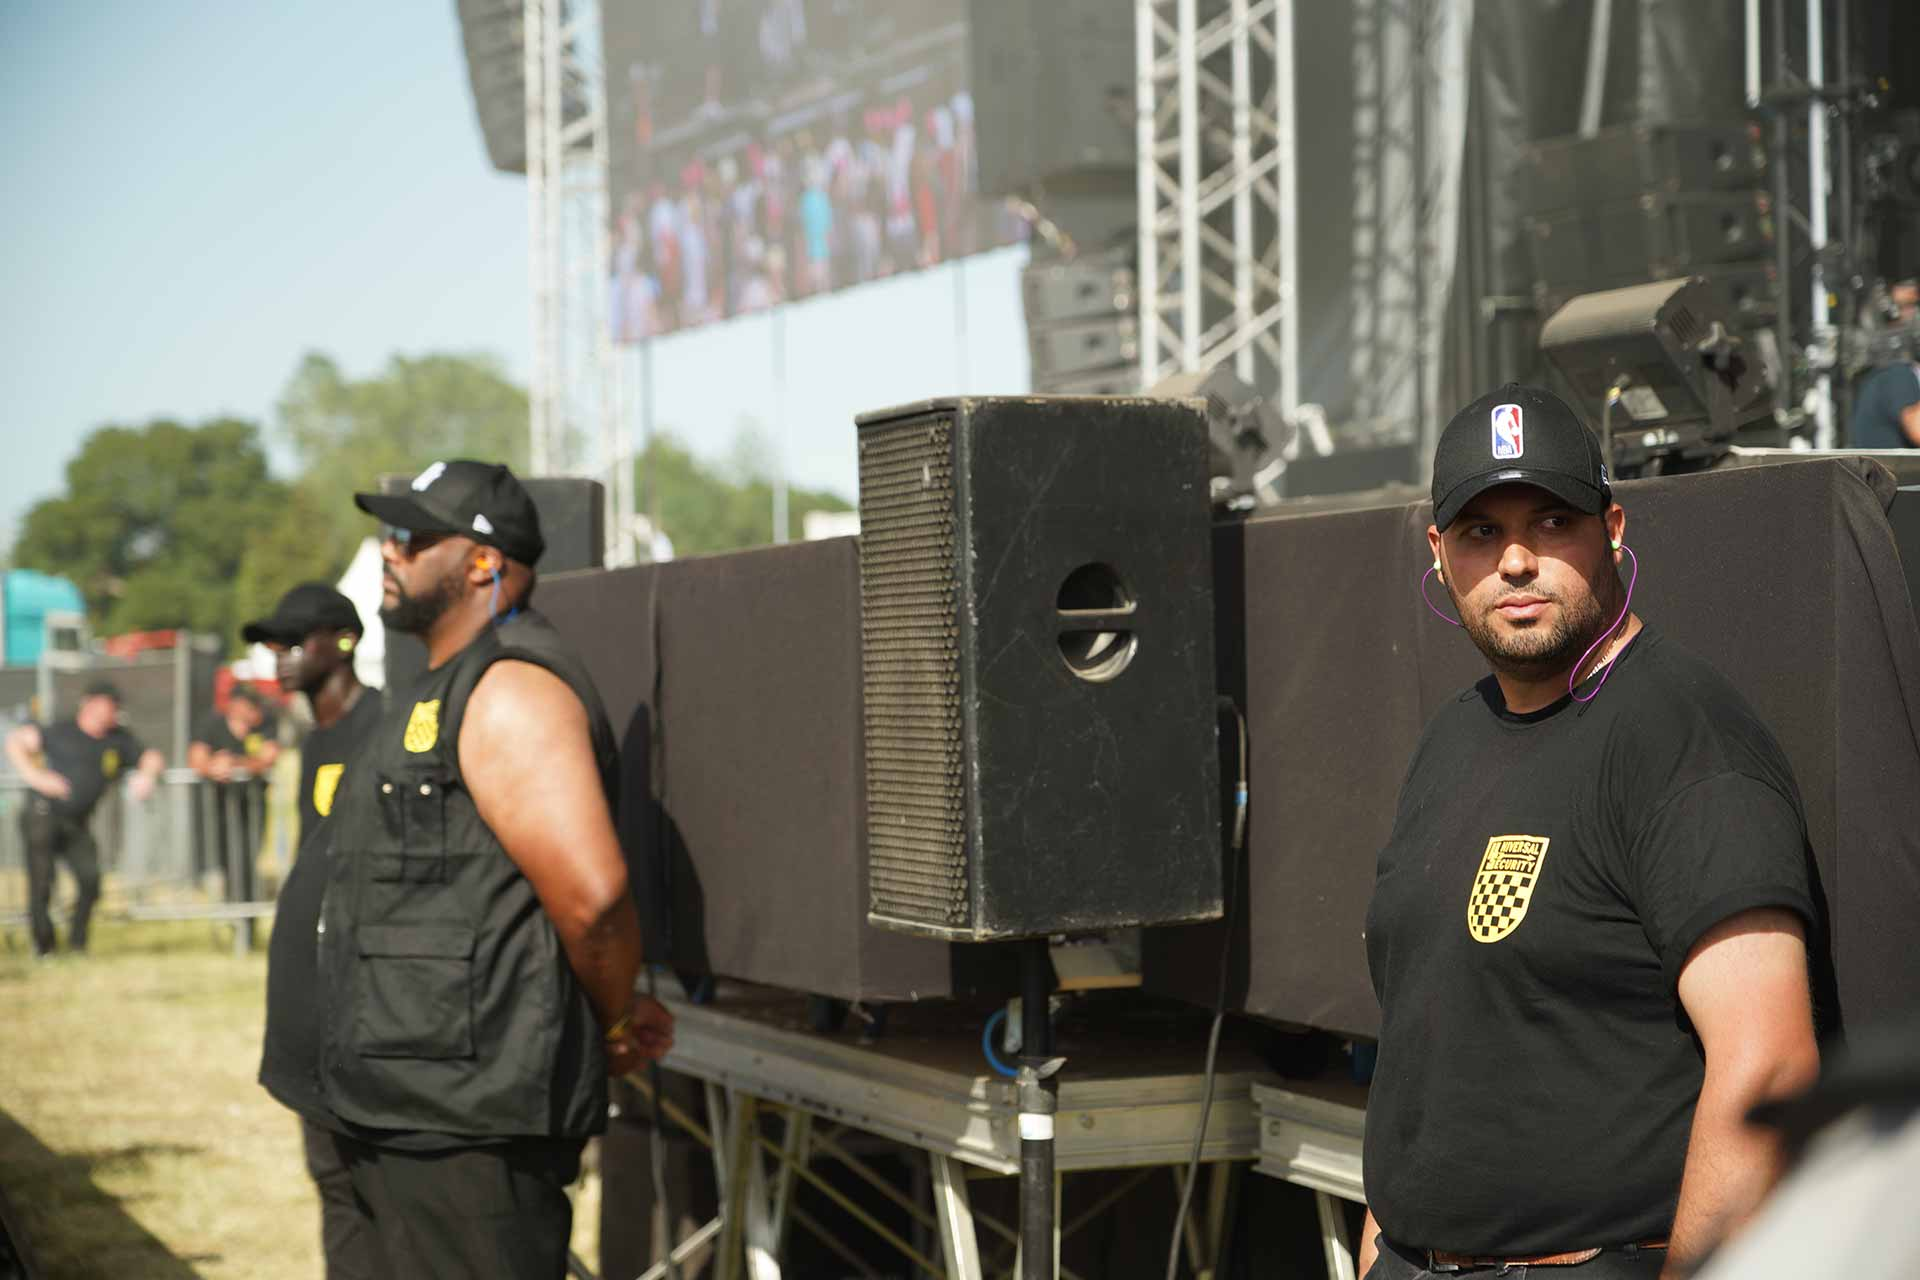 securite-universal-service-ordre-festival-normandie